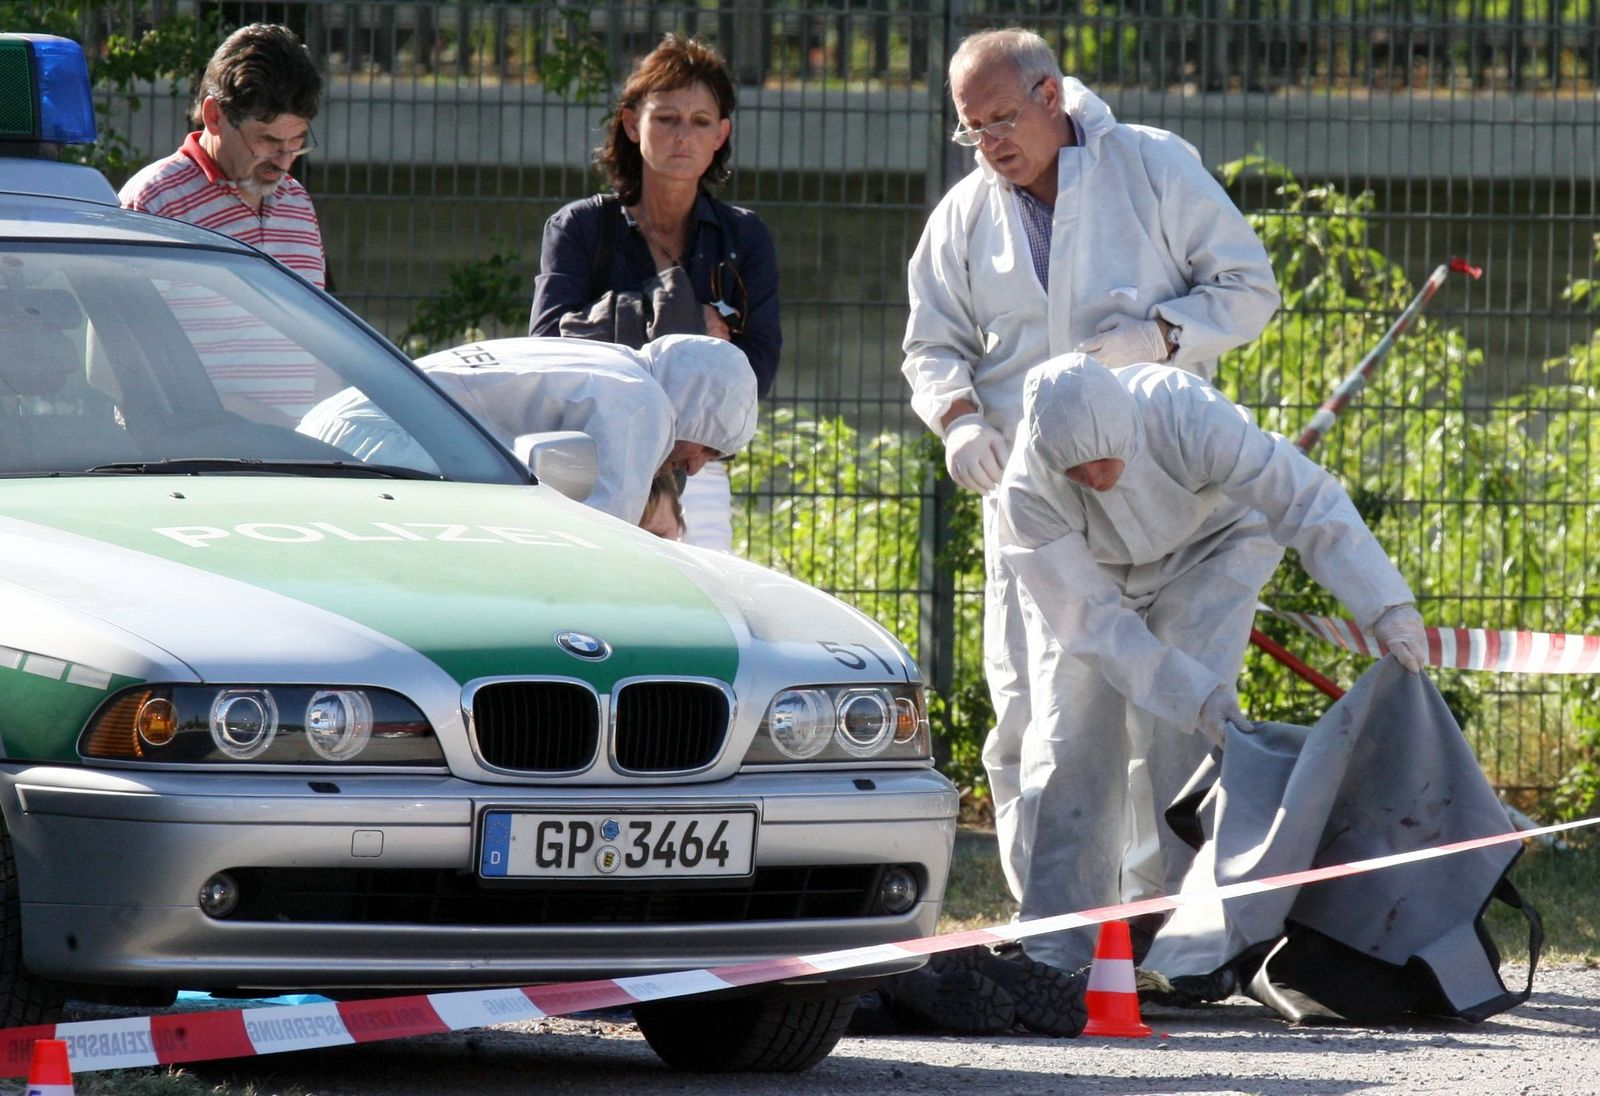 THEMEN Polizistenmord Heilbronn